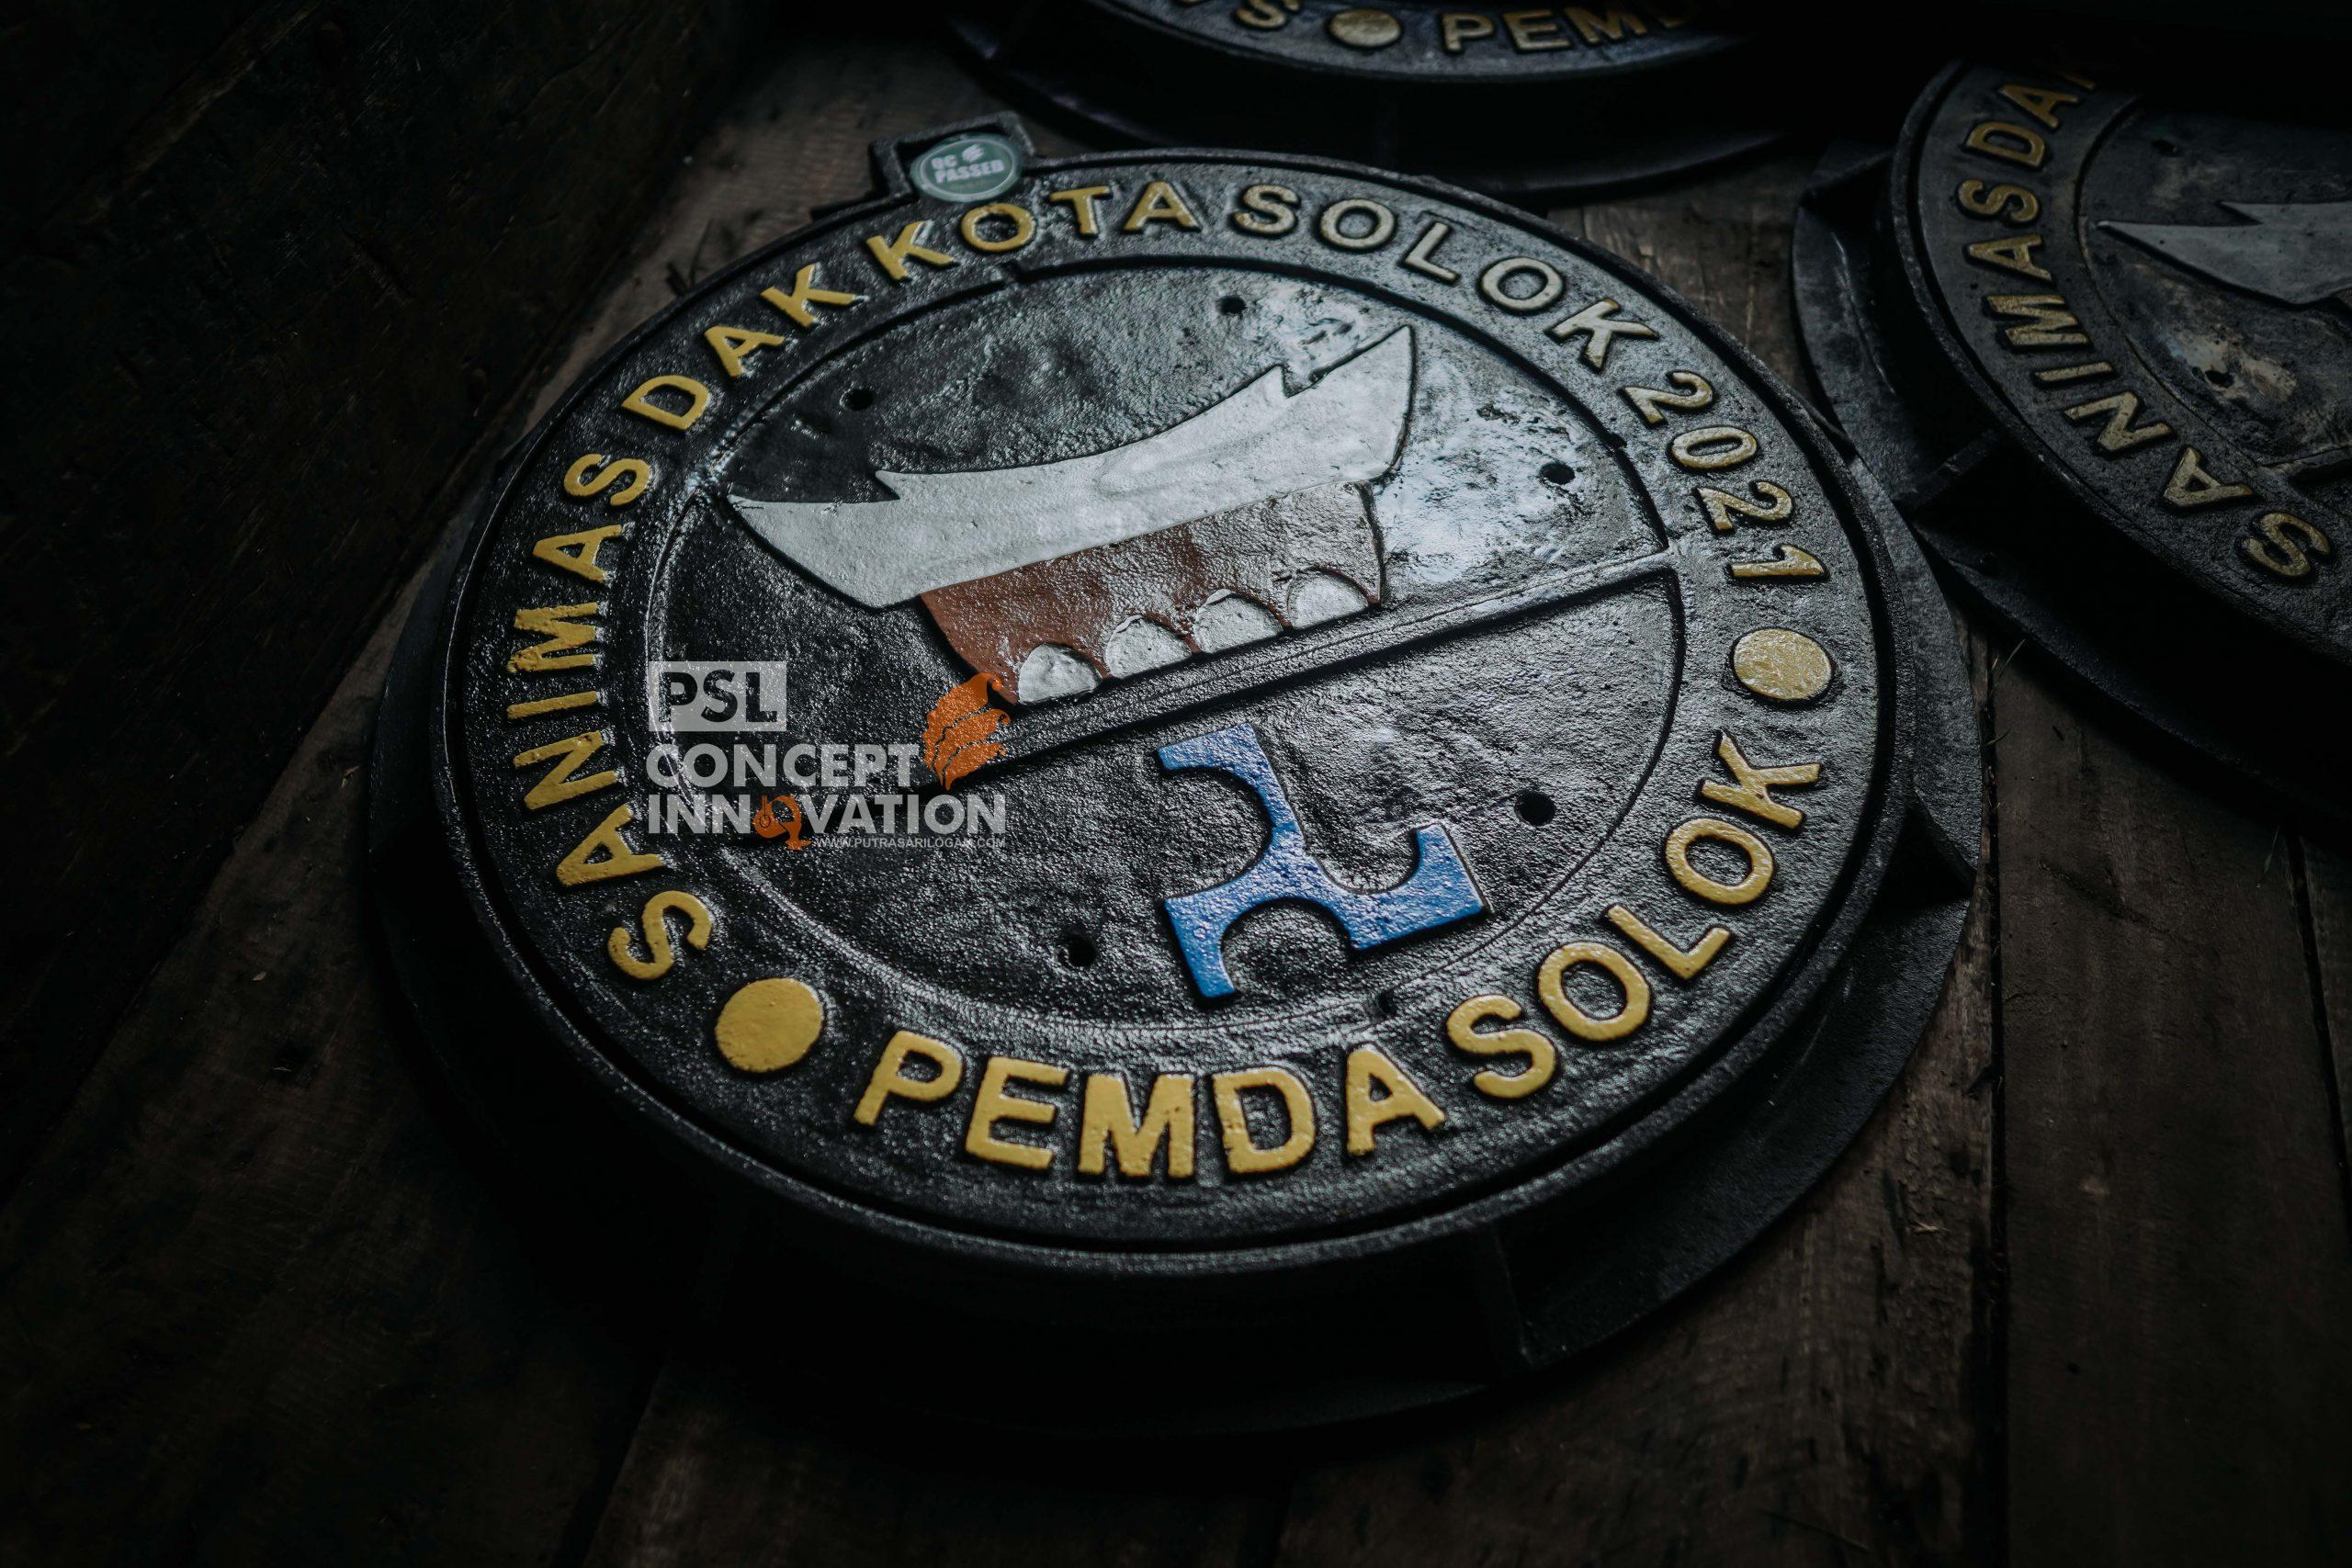 Manhole Cover Kota Solok 2021